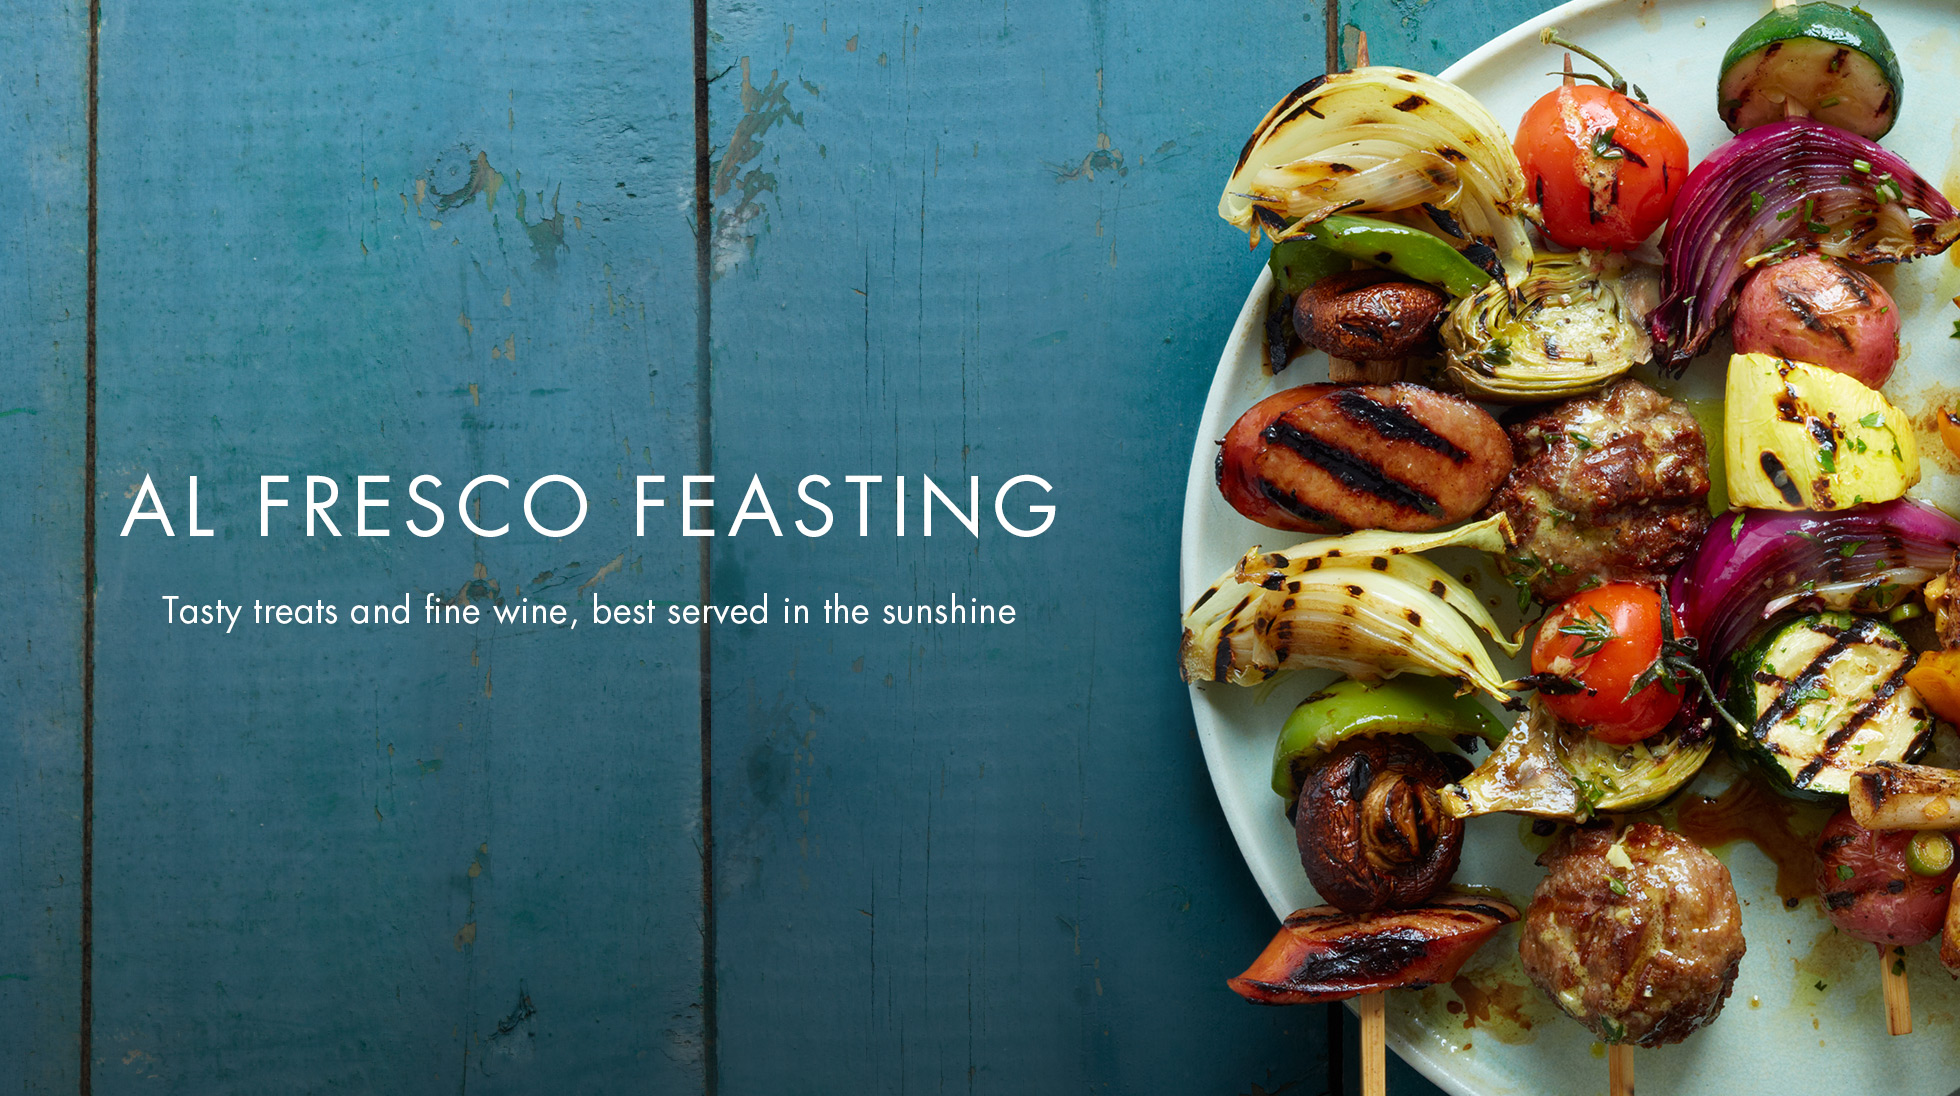 AL FRESCO FEASTING